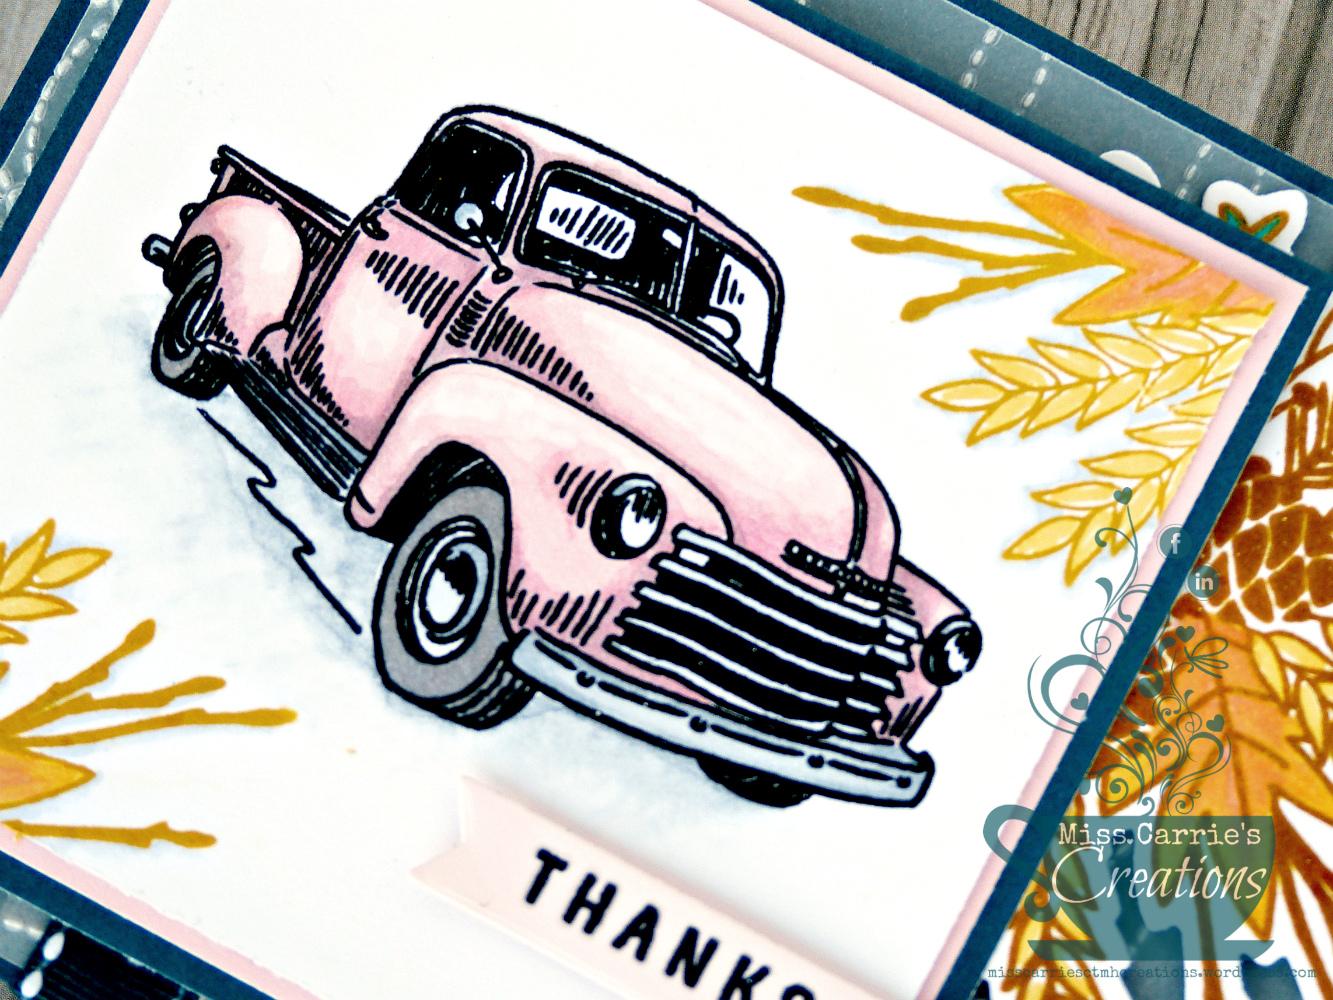 MissCarriesCreations-VintageThanks-Truck.jpg